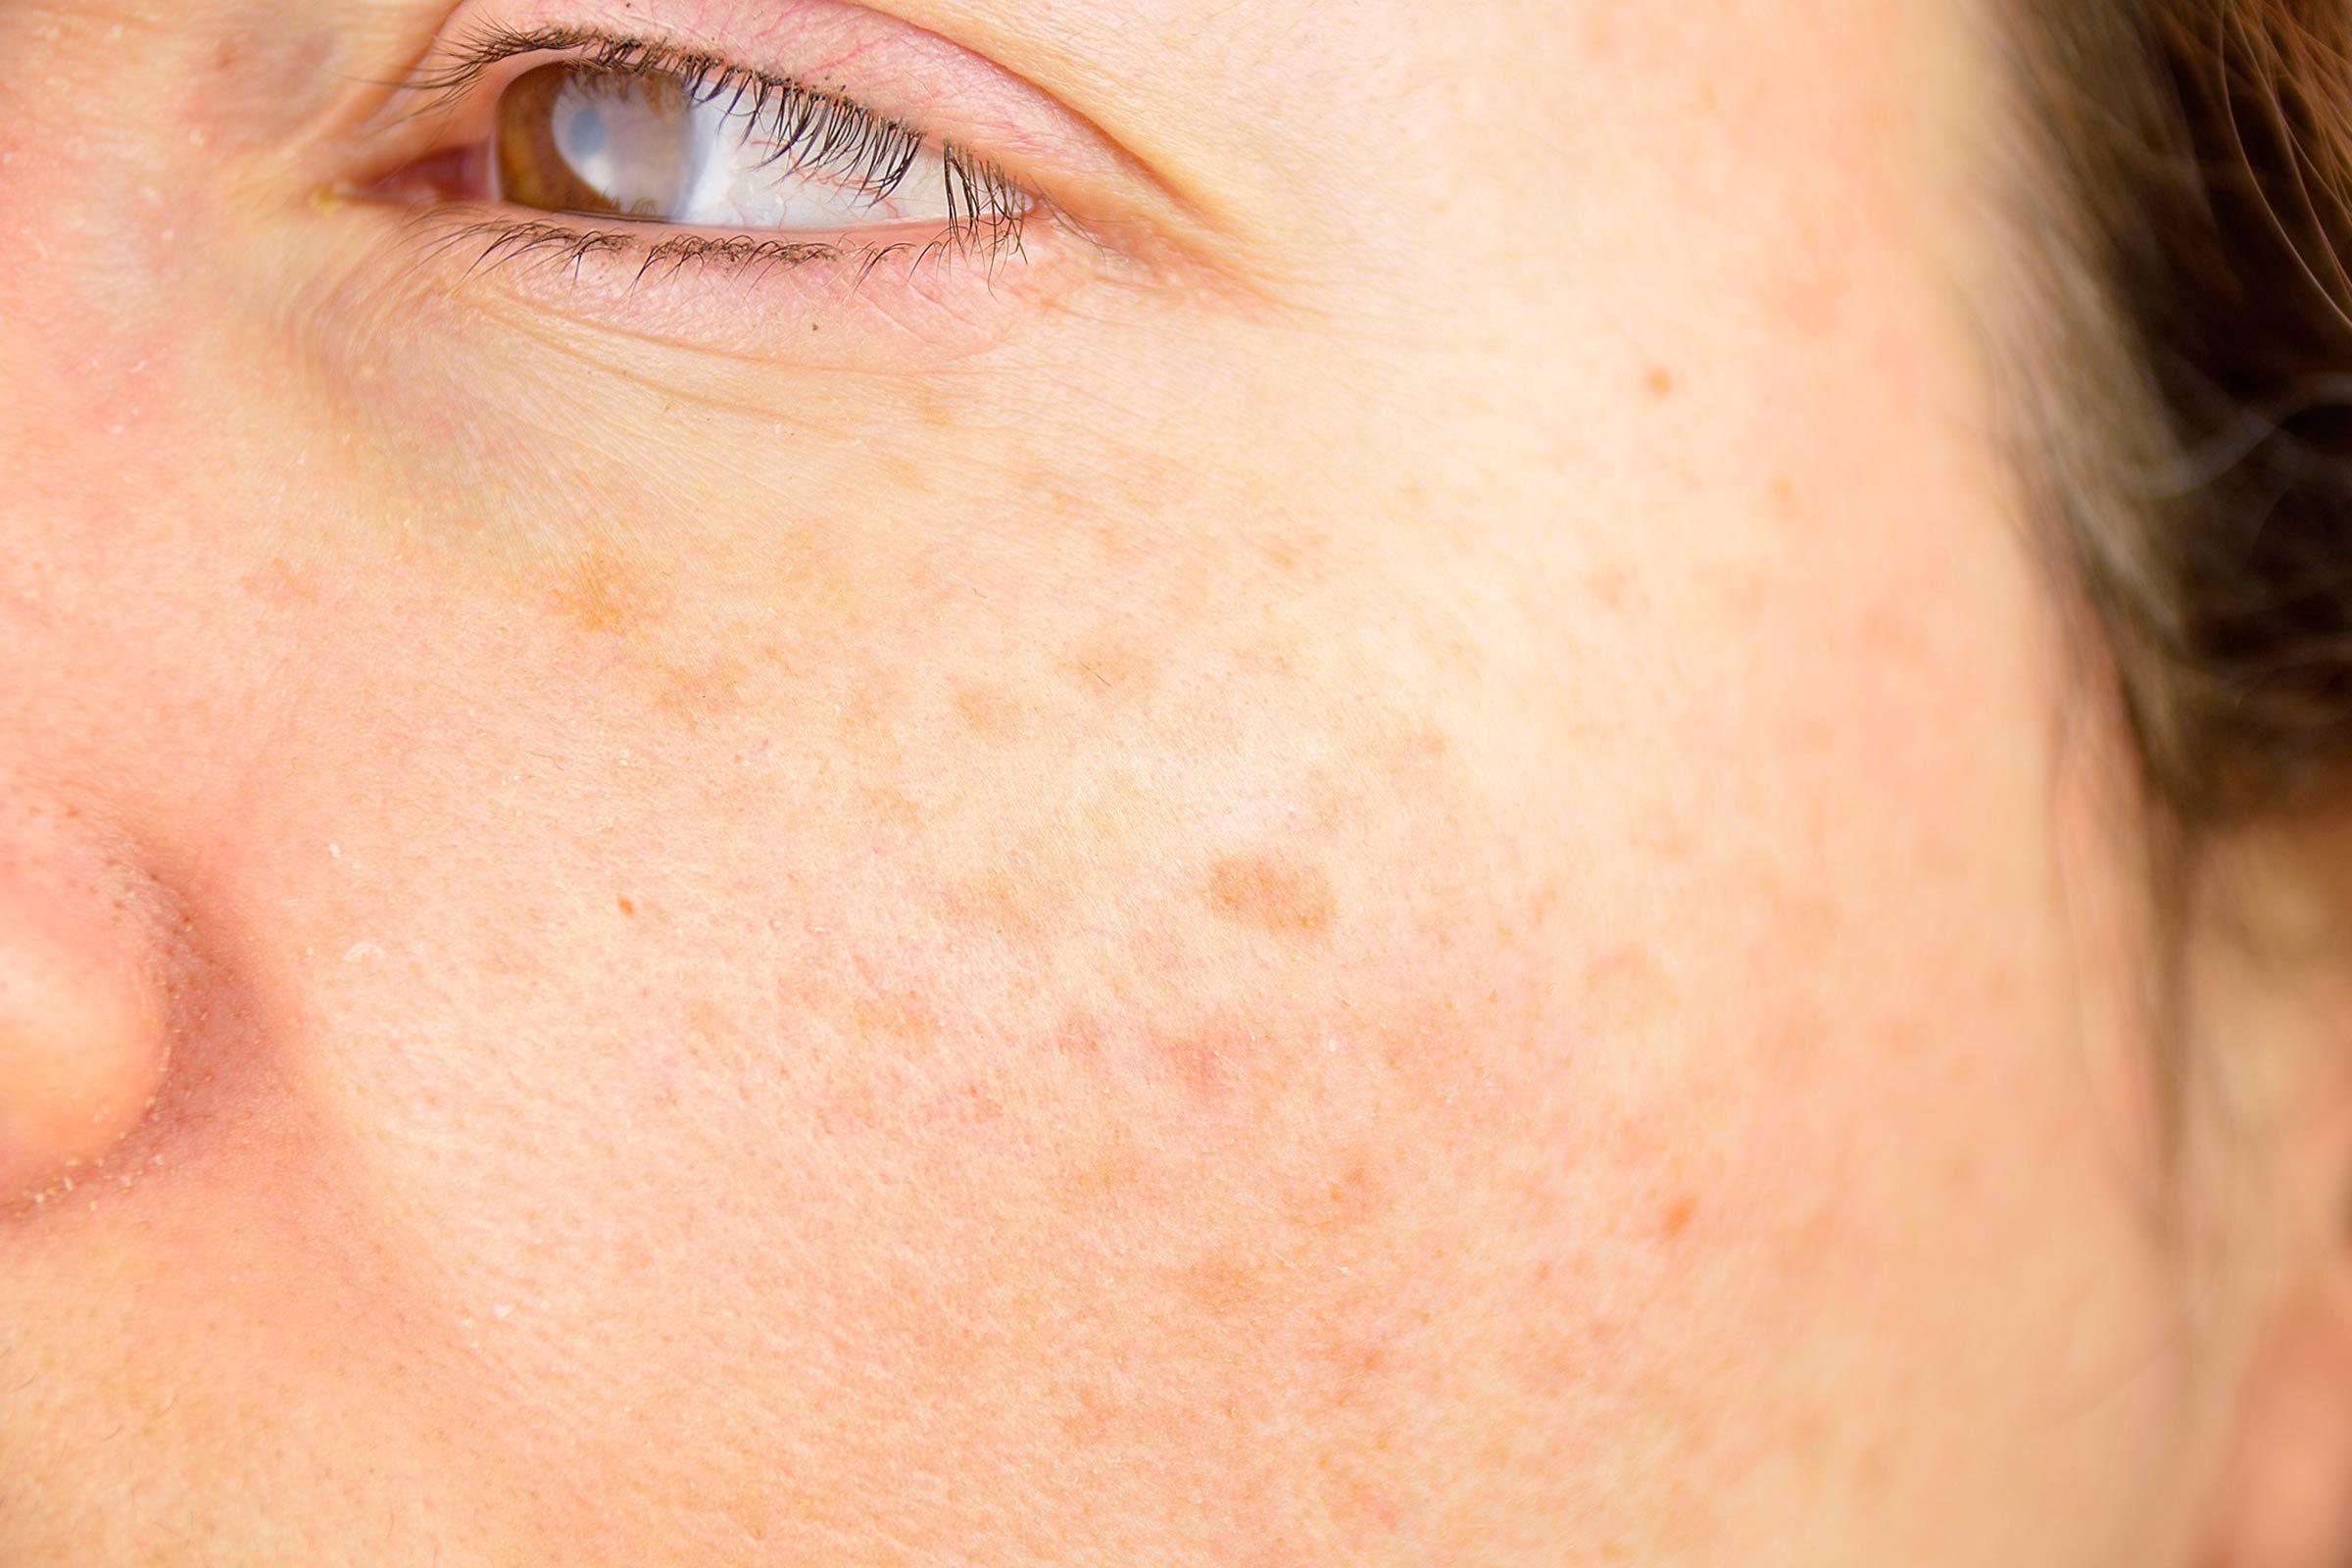 01-got-age-spots-heres-what-a-dermatologist-would-do-600165480-Manuel-Faba-Ortega